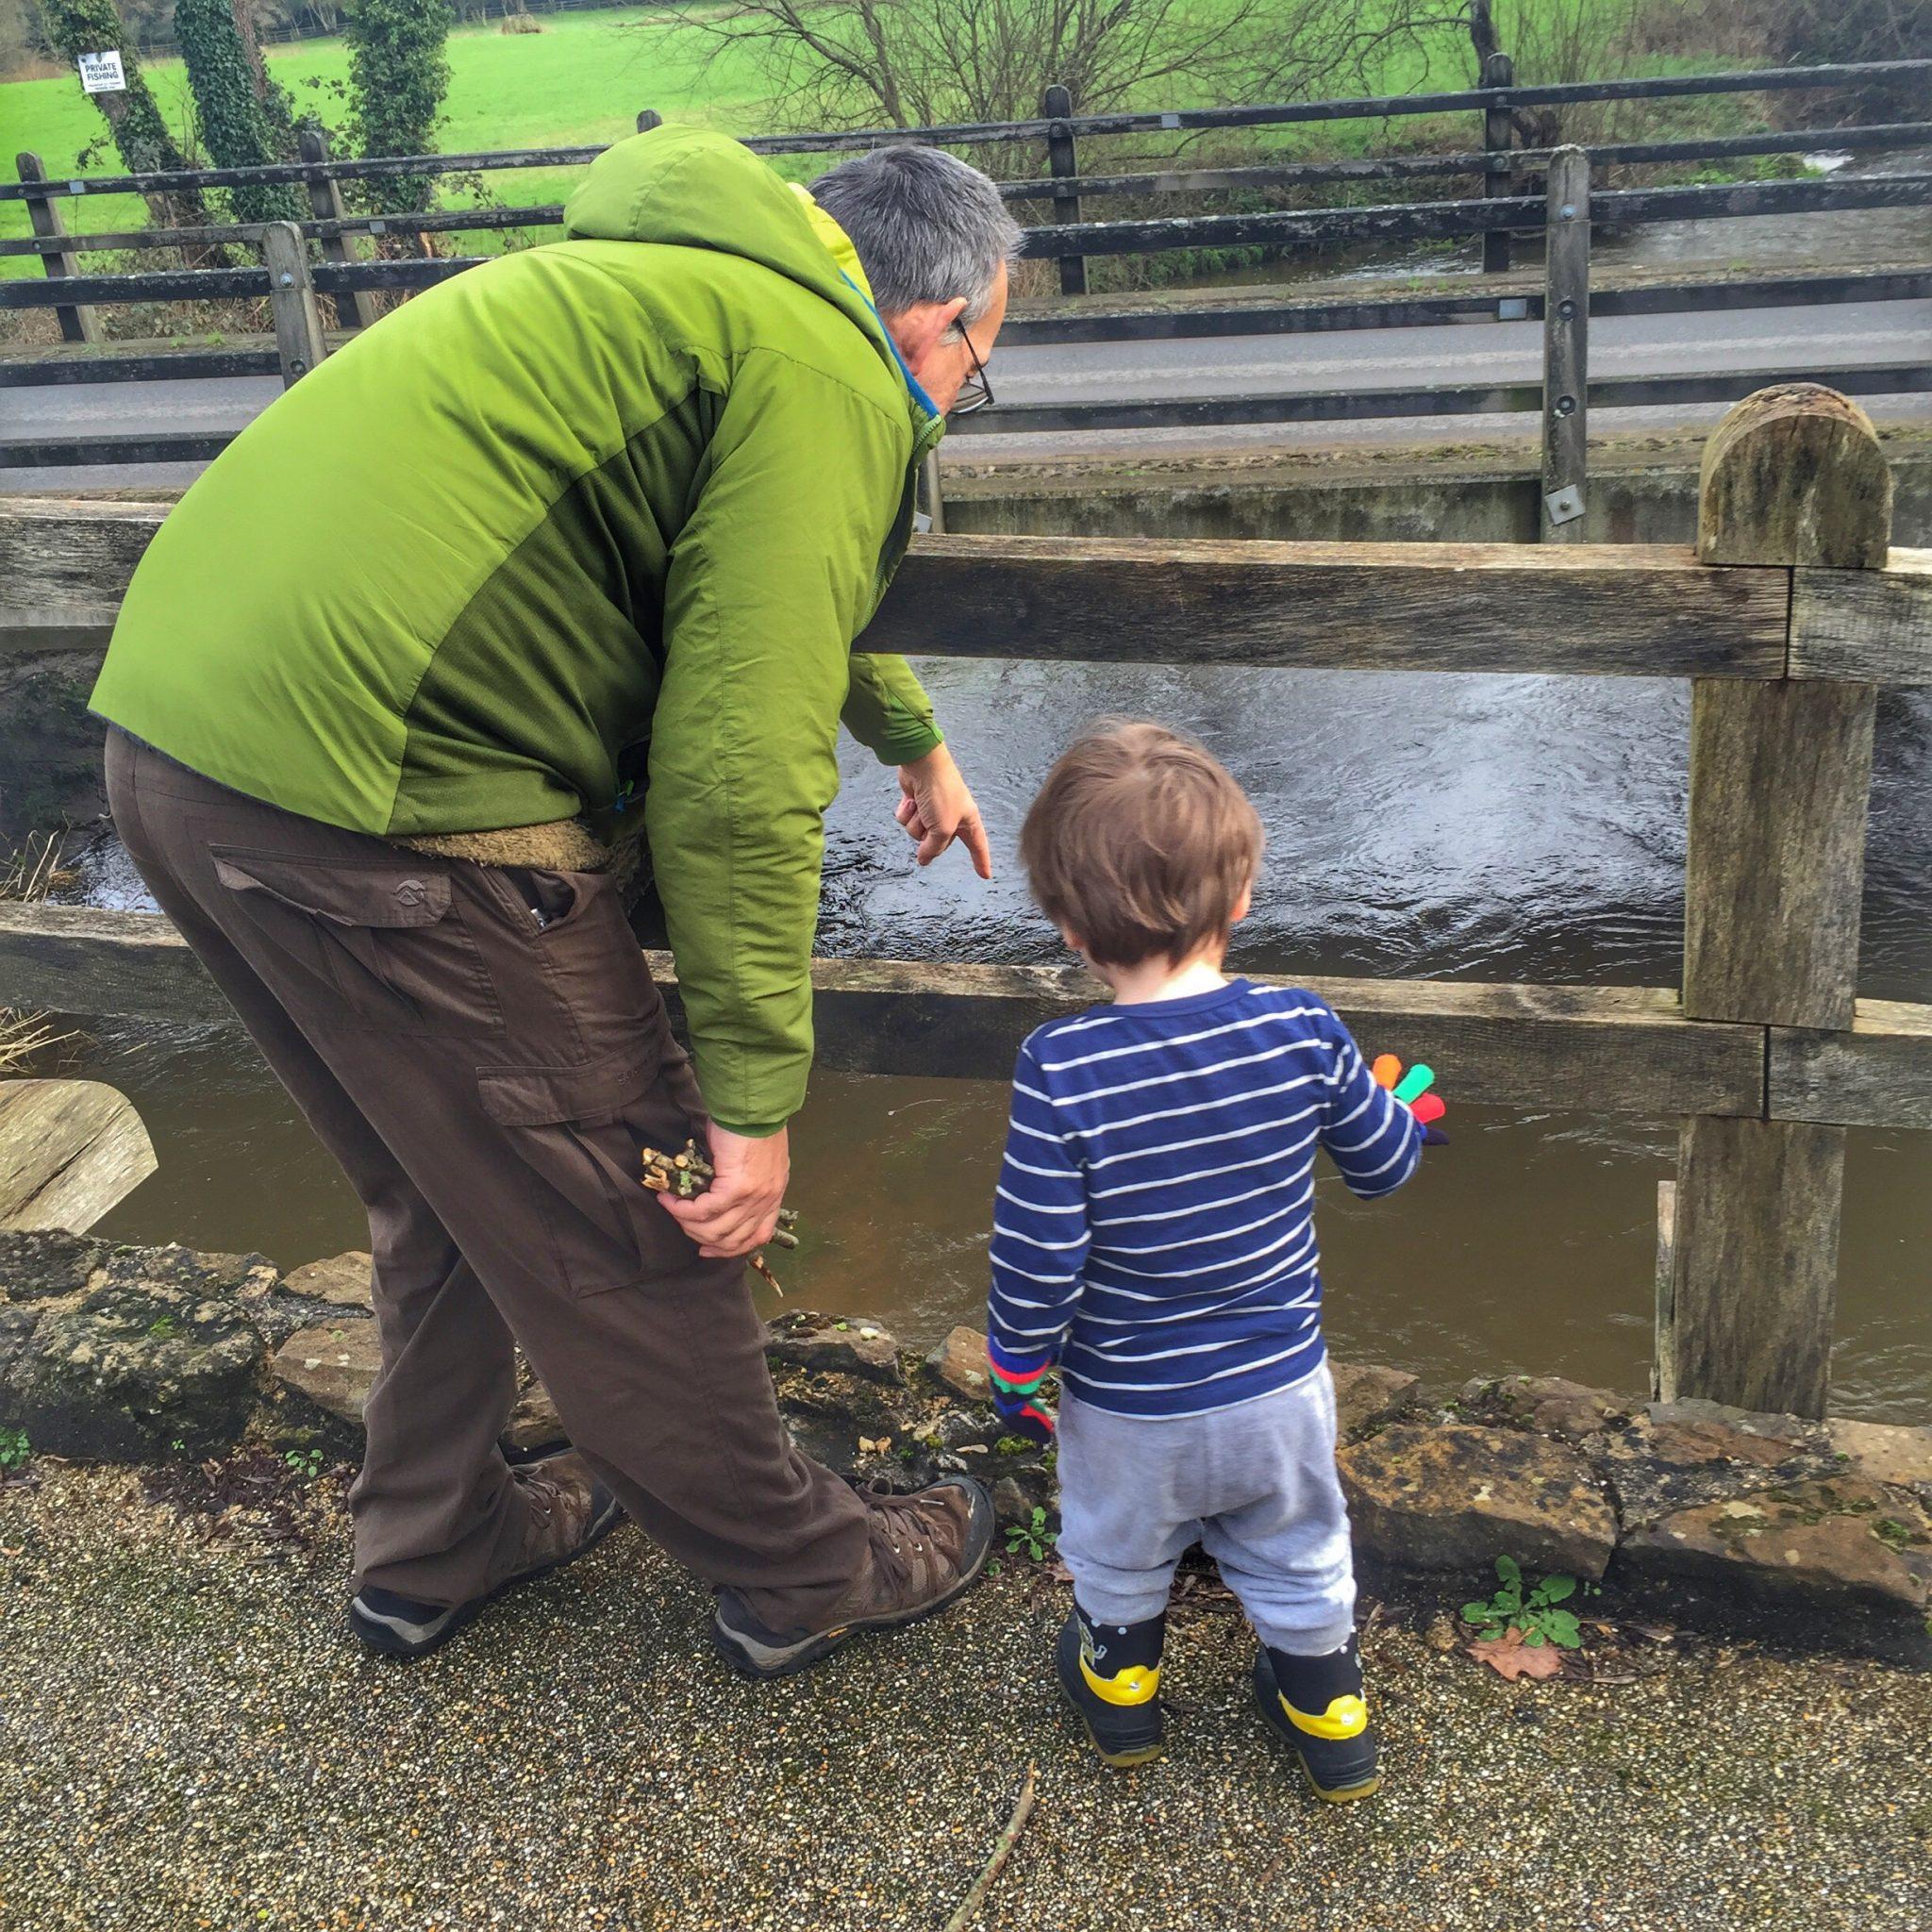 Pooh Sticks on AA Milne's Birthday in Tilford,Surrey at https://lukeosaurusandme.co.uk @gloryiscalling